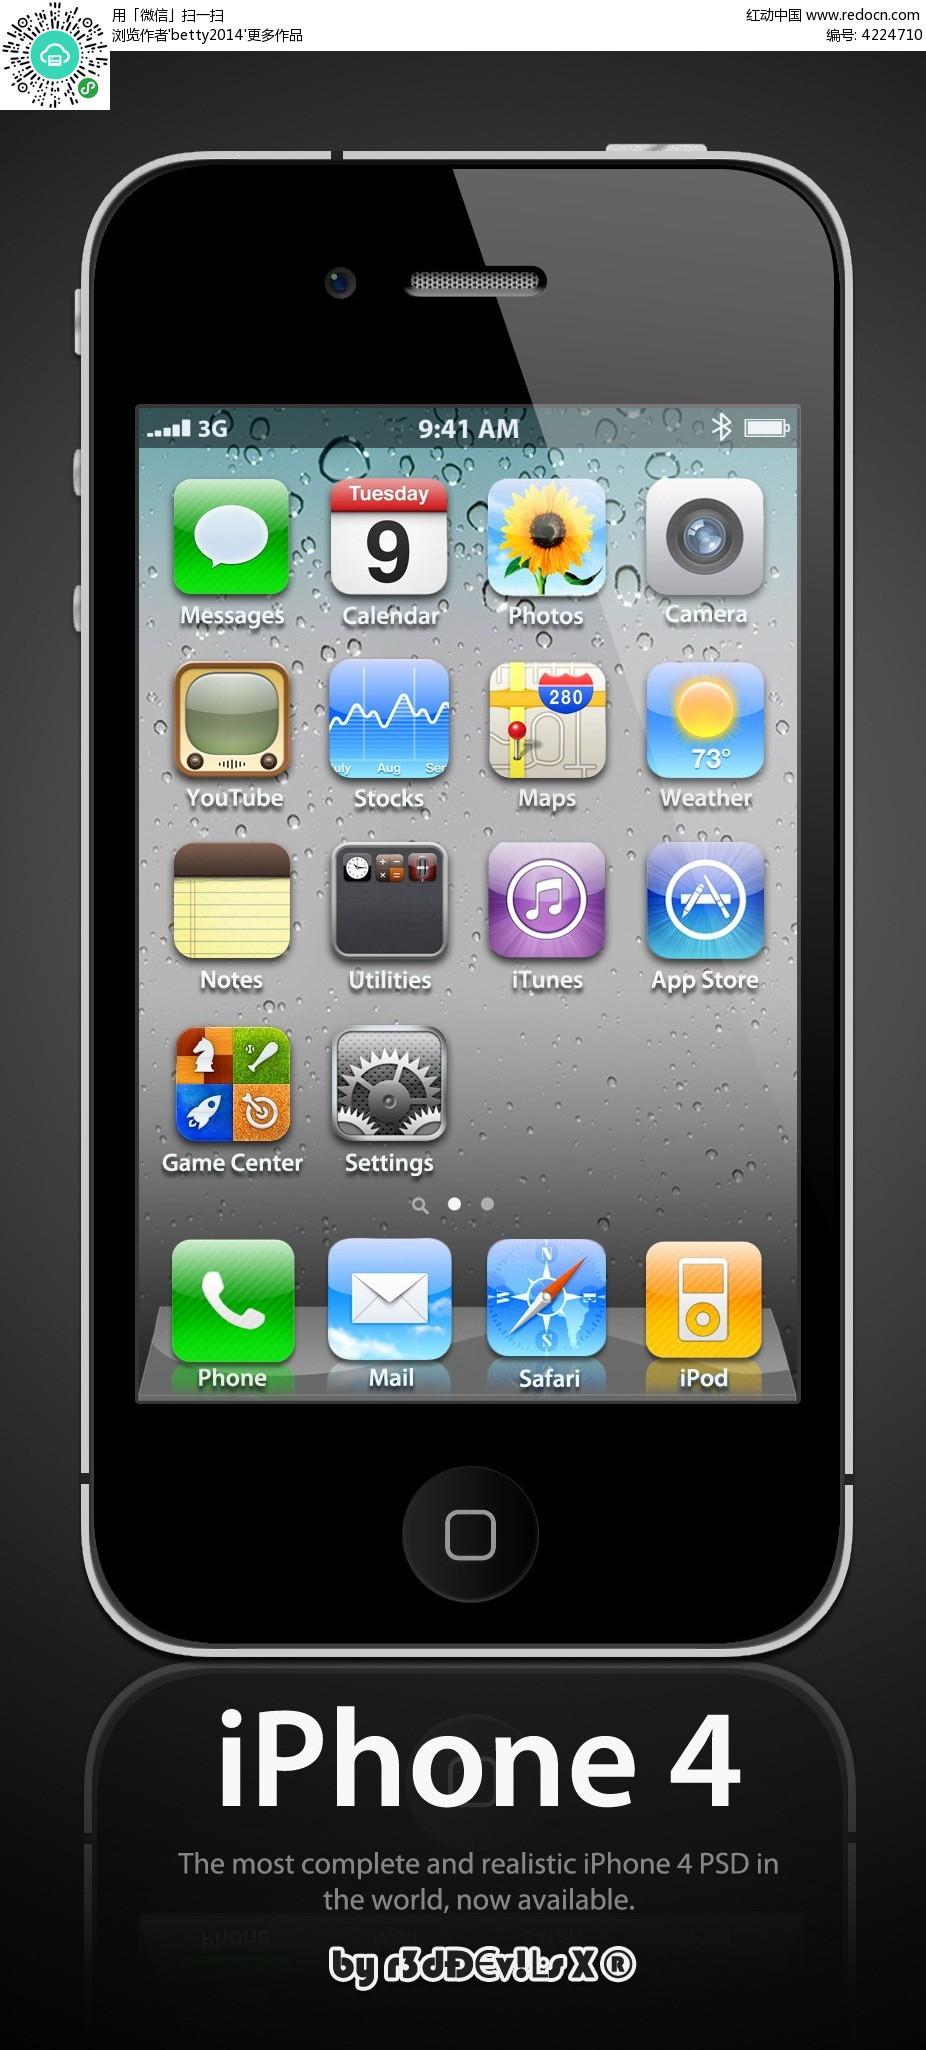 iphone4手机黑色苹果转包手机安卓图片